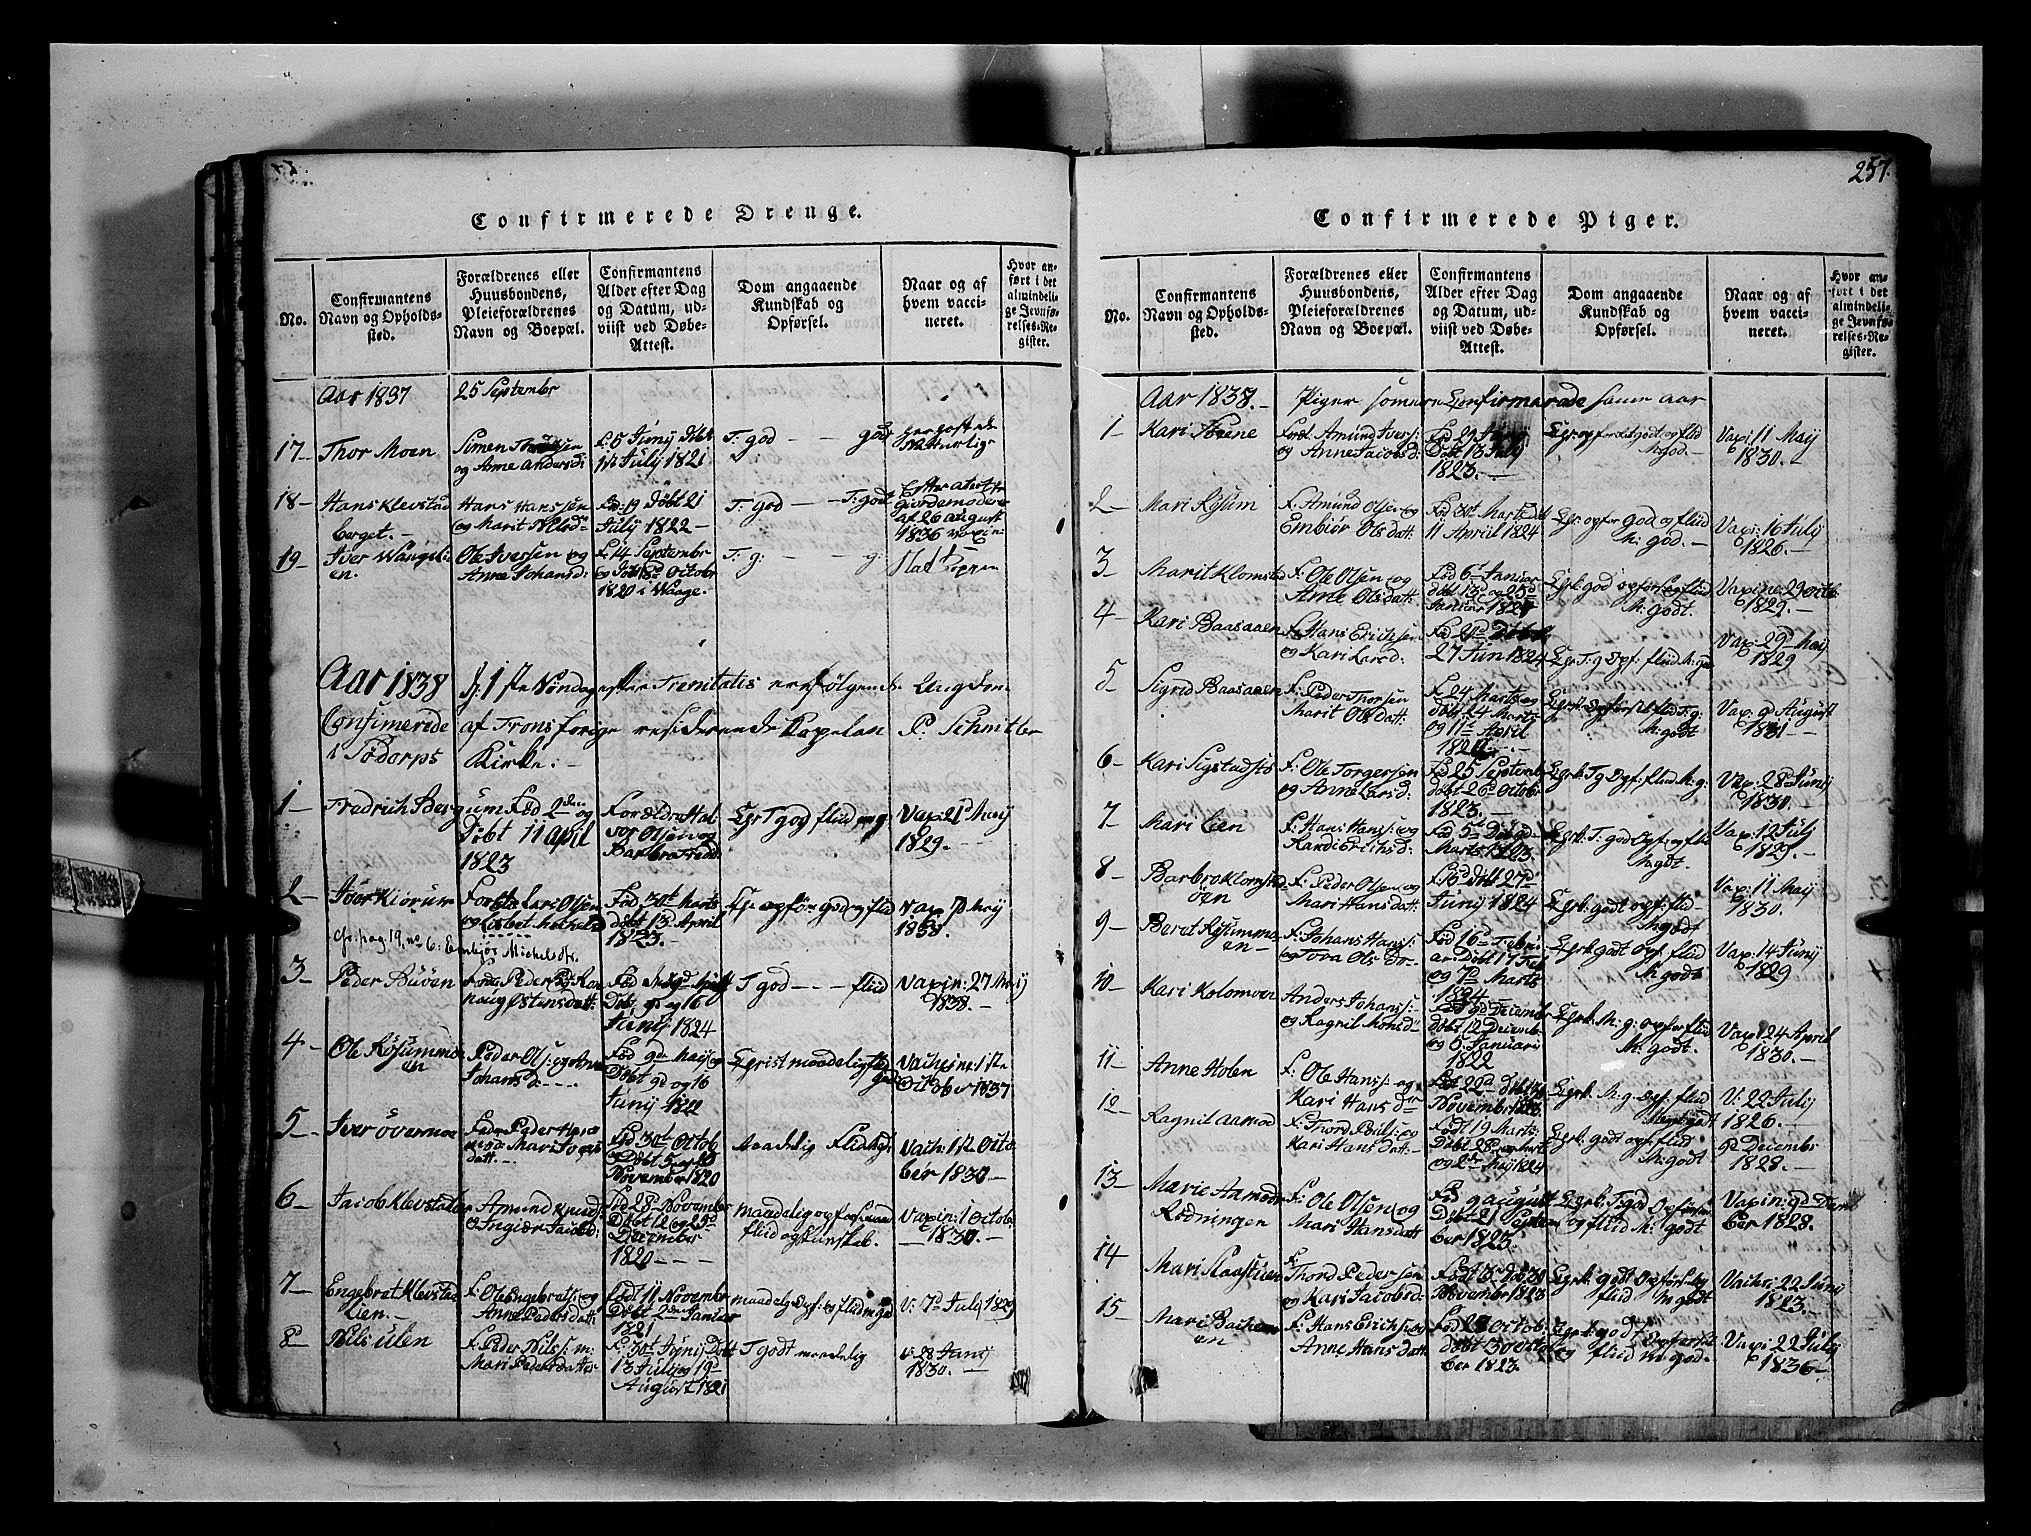 SAH, Fron prestekontor, H/Ha/Hab/L0002: Klokkerbok nr. 2, 1816-1850, s. 257